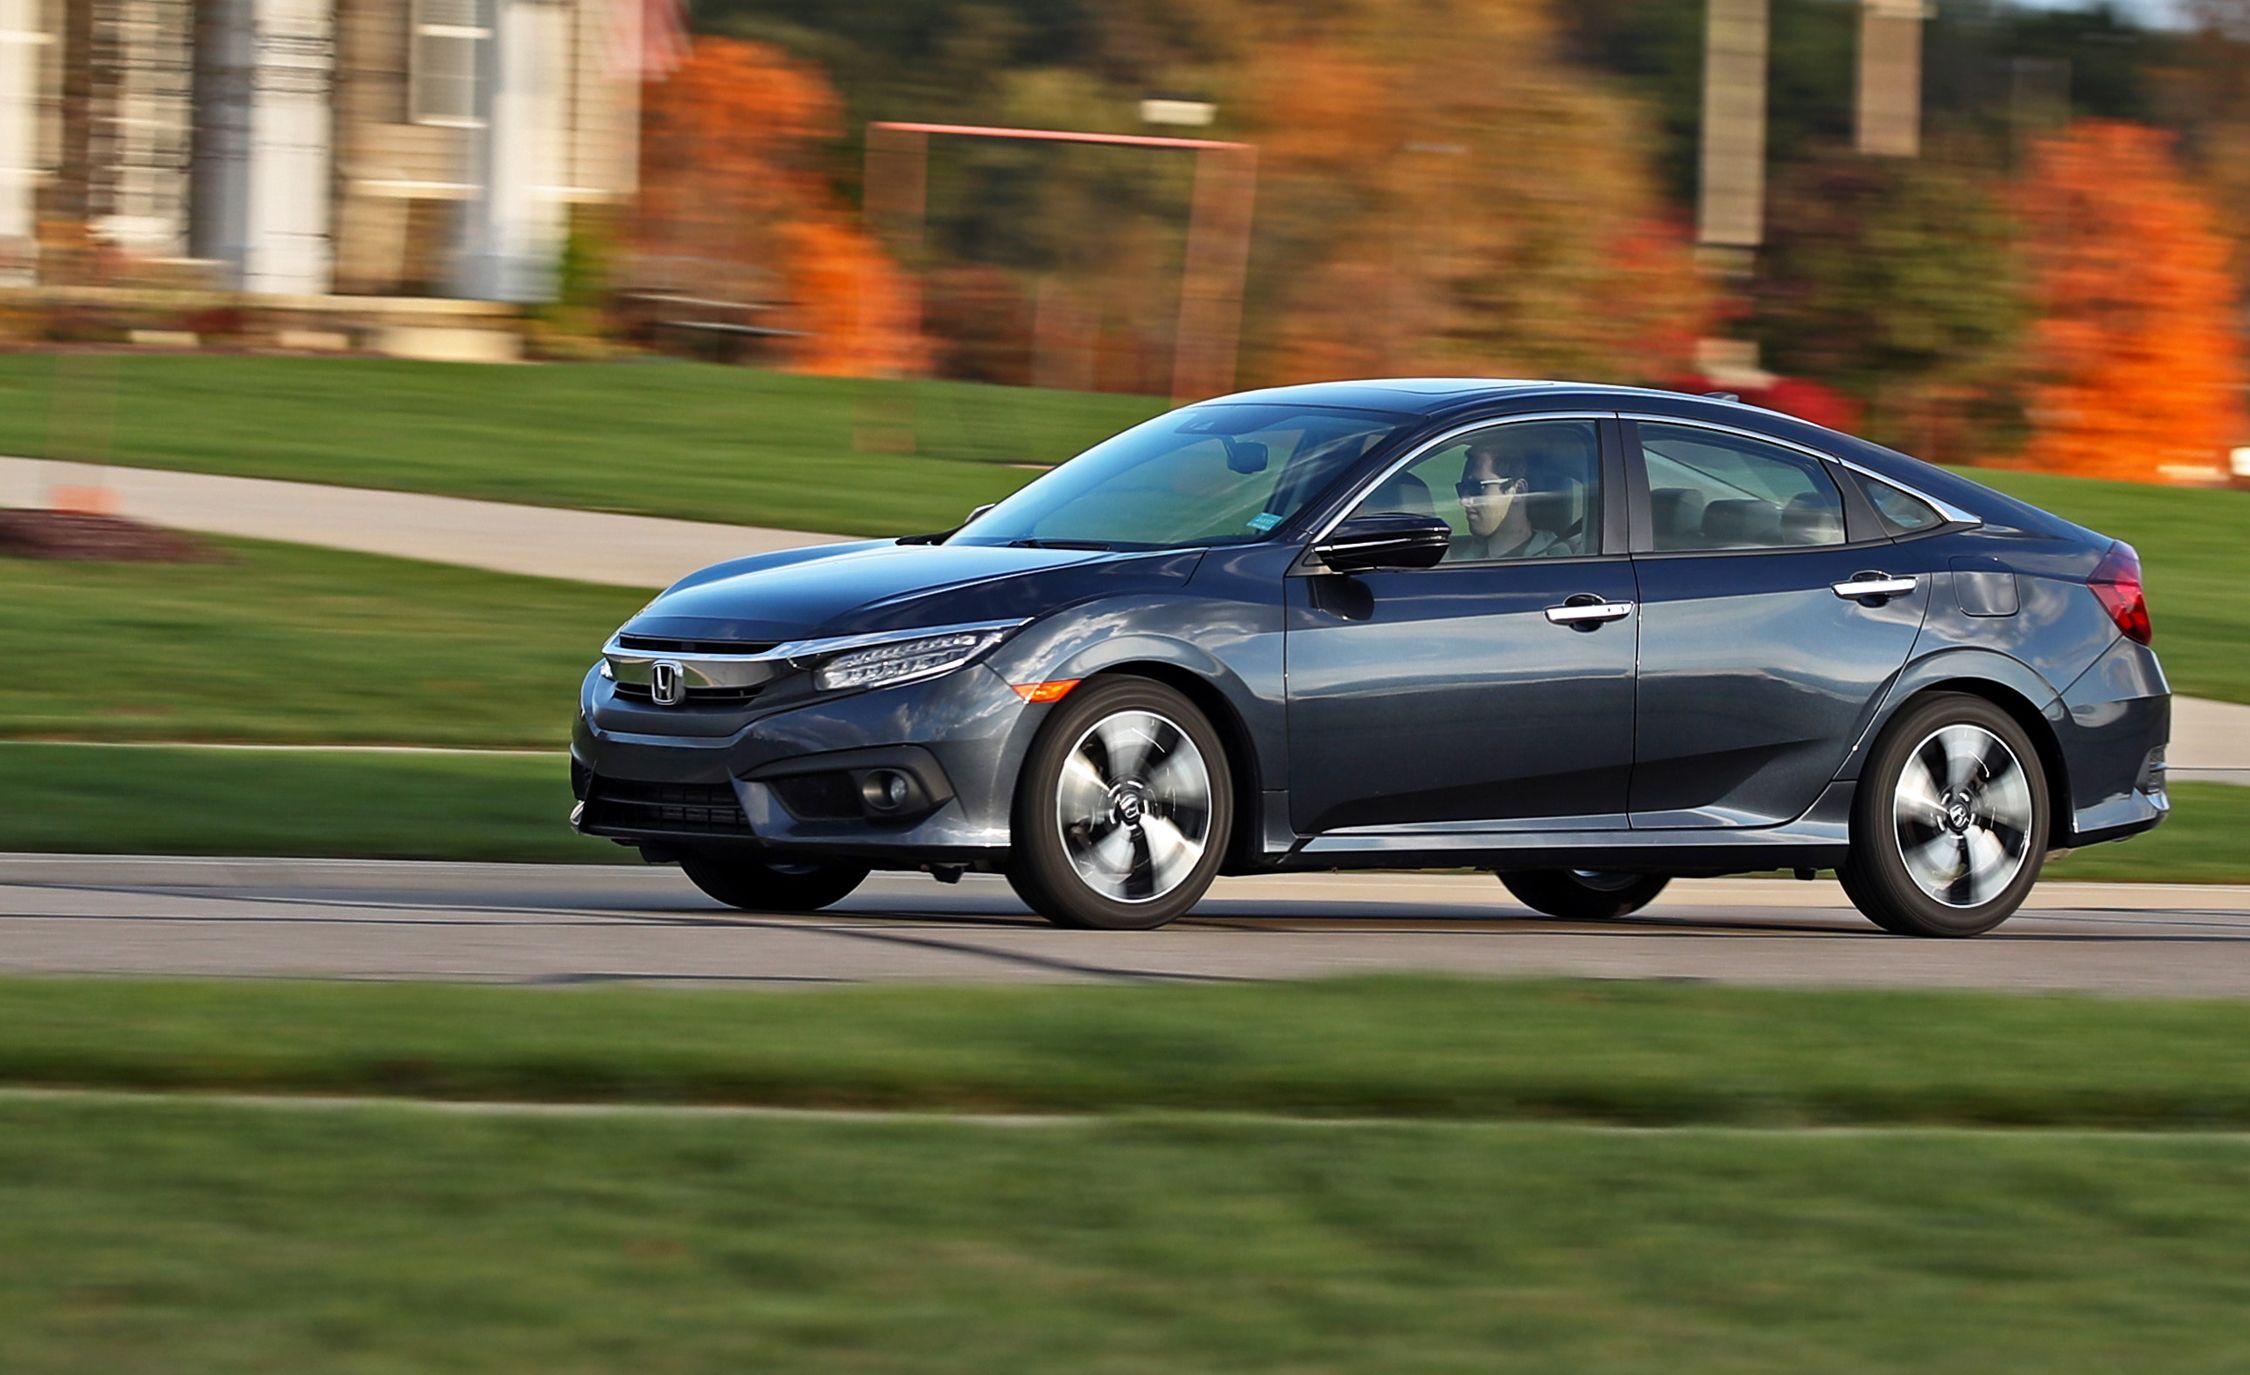 honda civic coupe manual 2016 review